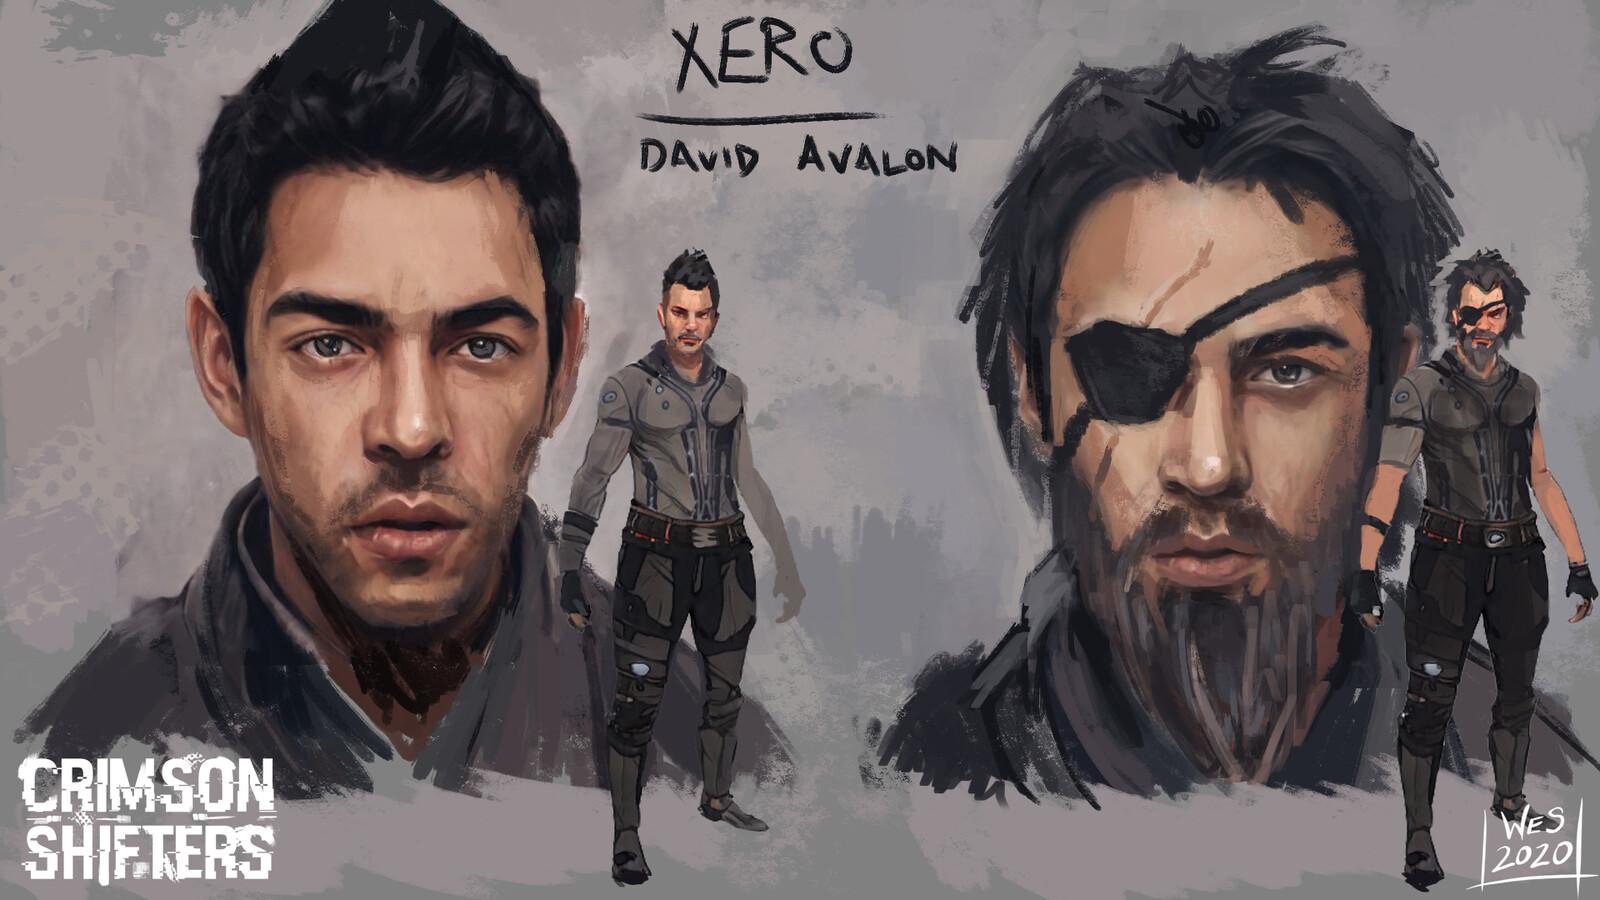 Crimson Shifters - Character Art - Xero